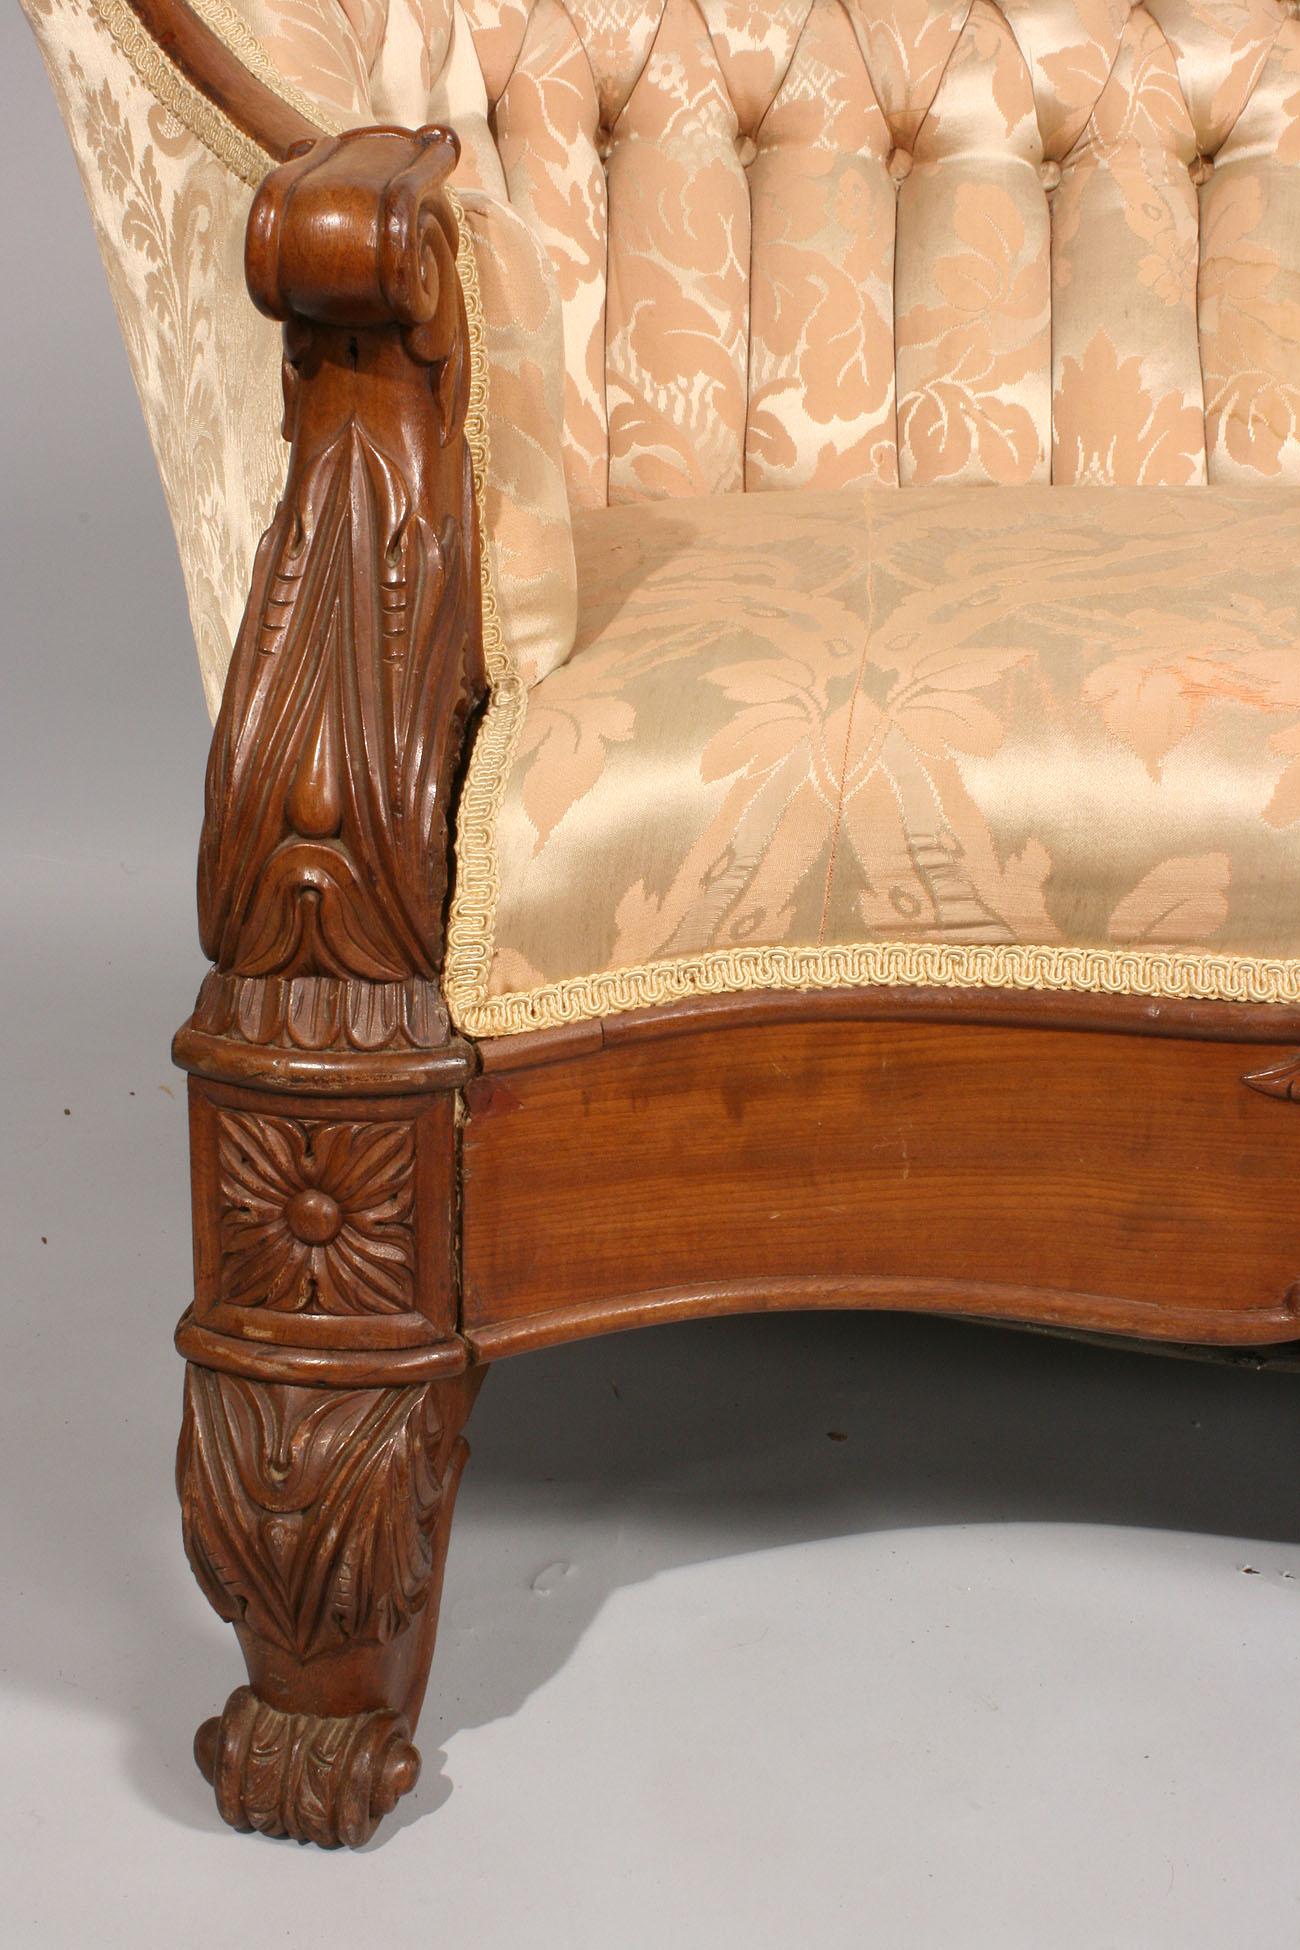 Lot 473 Rococo Revival Victorian Sofa